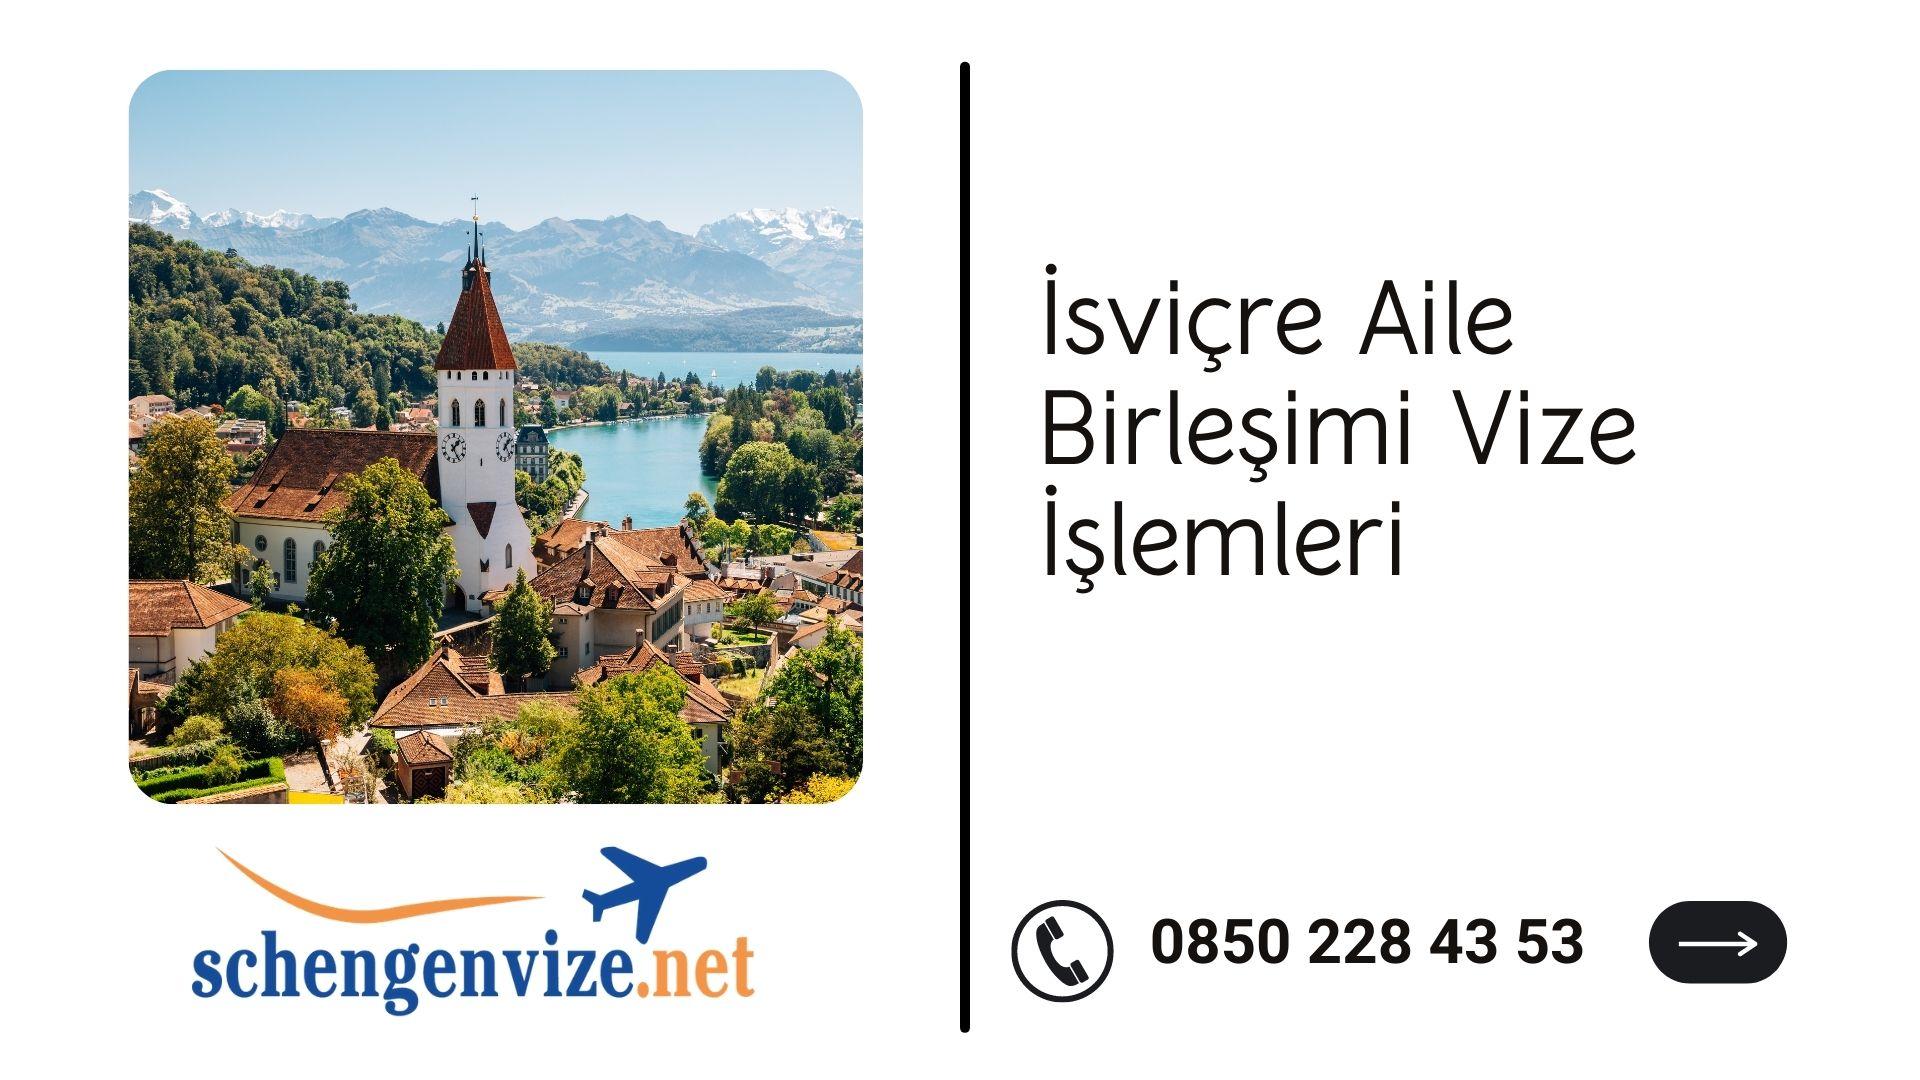 İsviçre Aile Birleşimi Vize İşlemleri